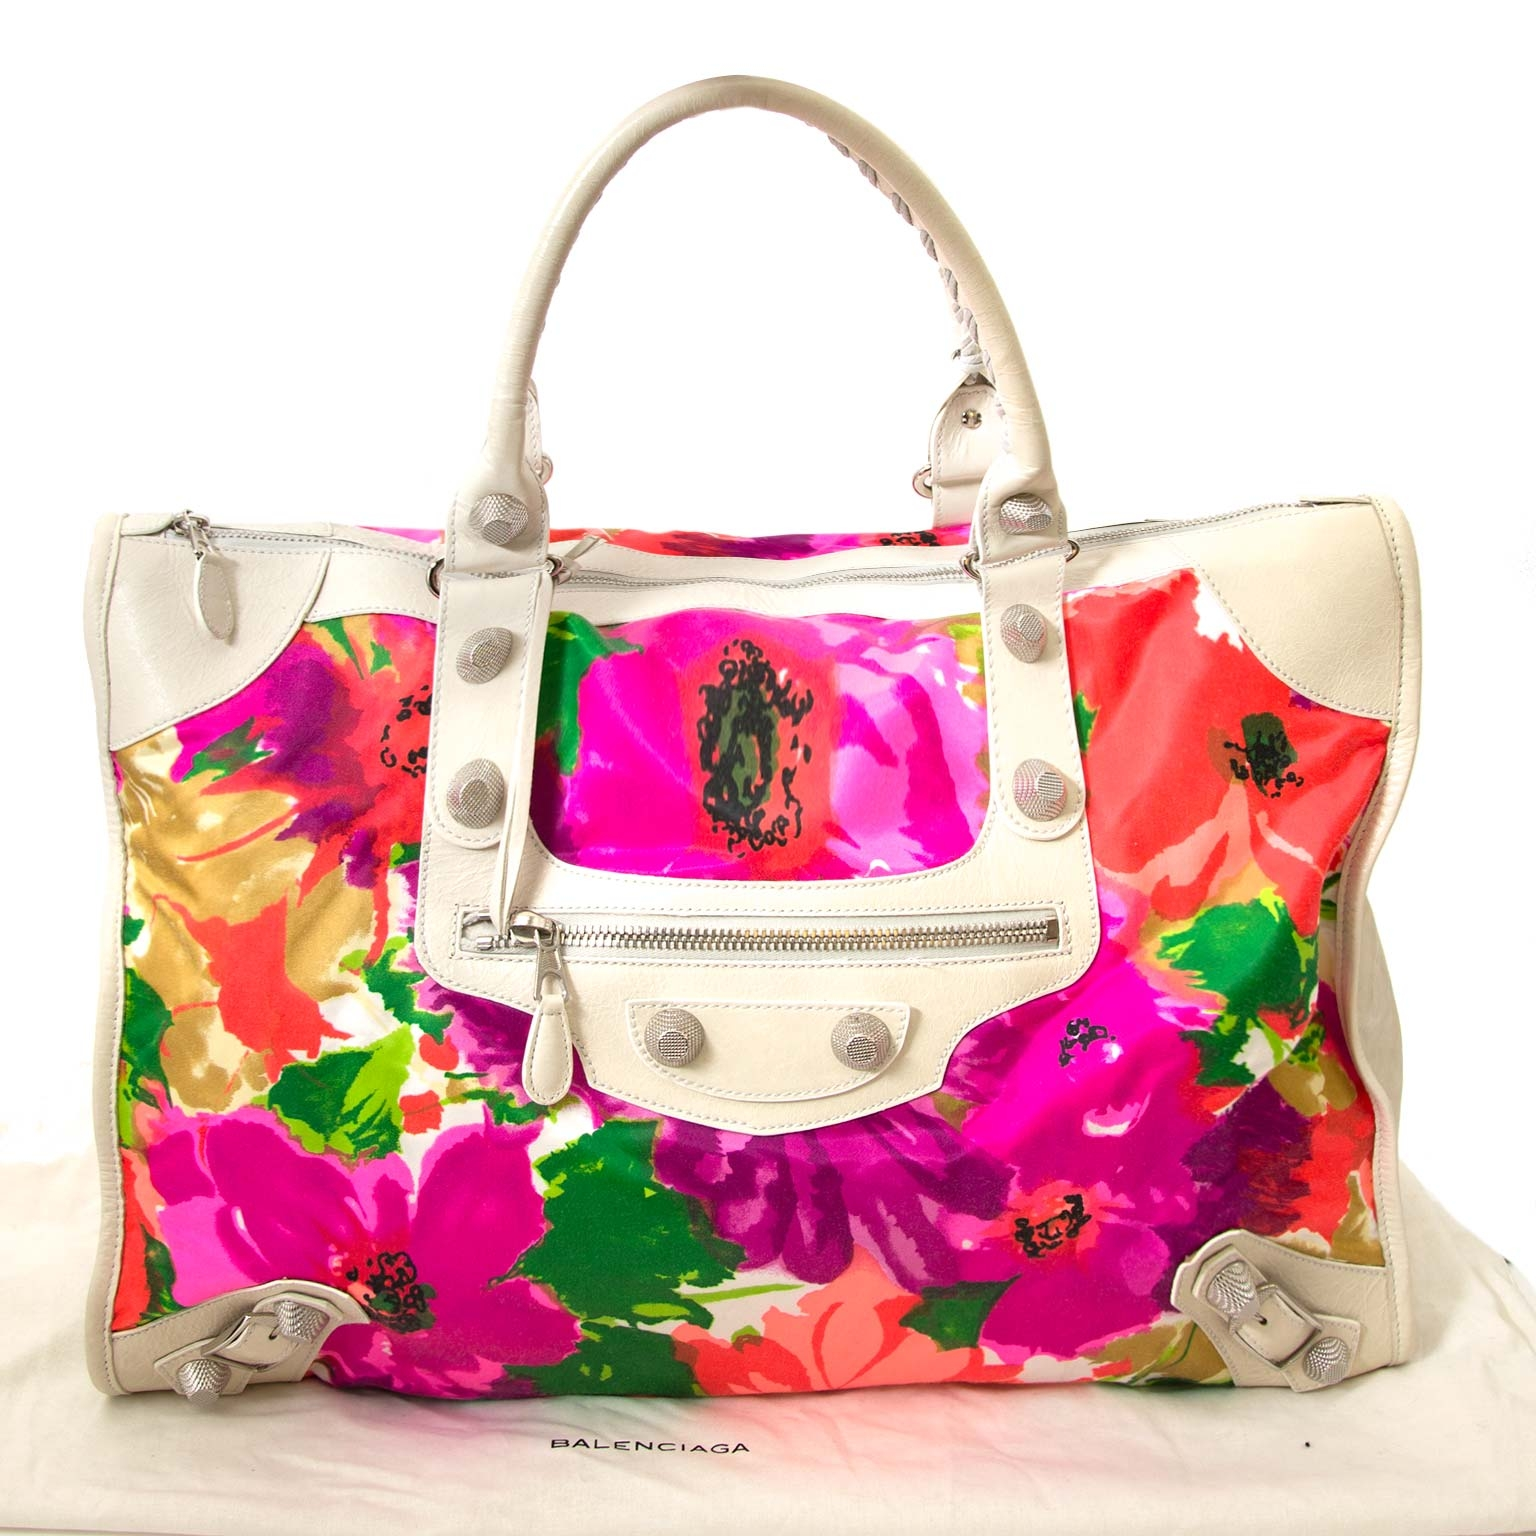 ... koop balenciaga giant 21 extra-large bloemen city tas bij labellov  vintage mode webshop 59a02c6d38ba5